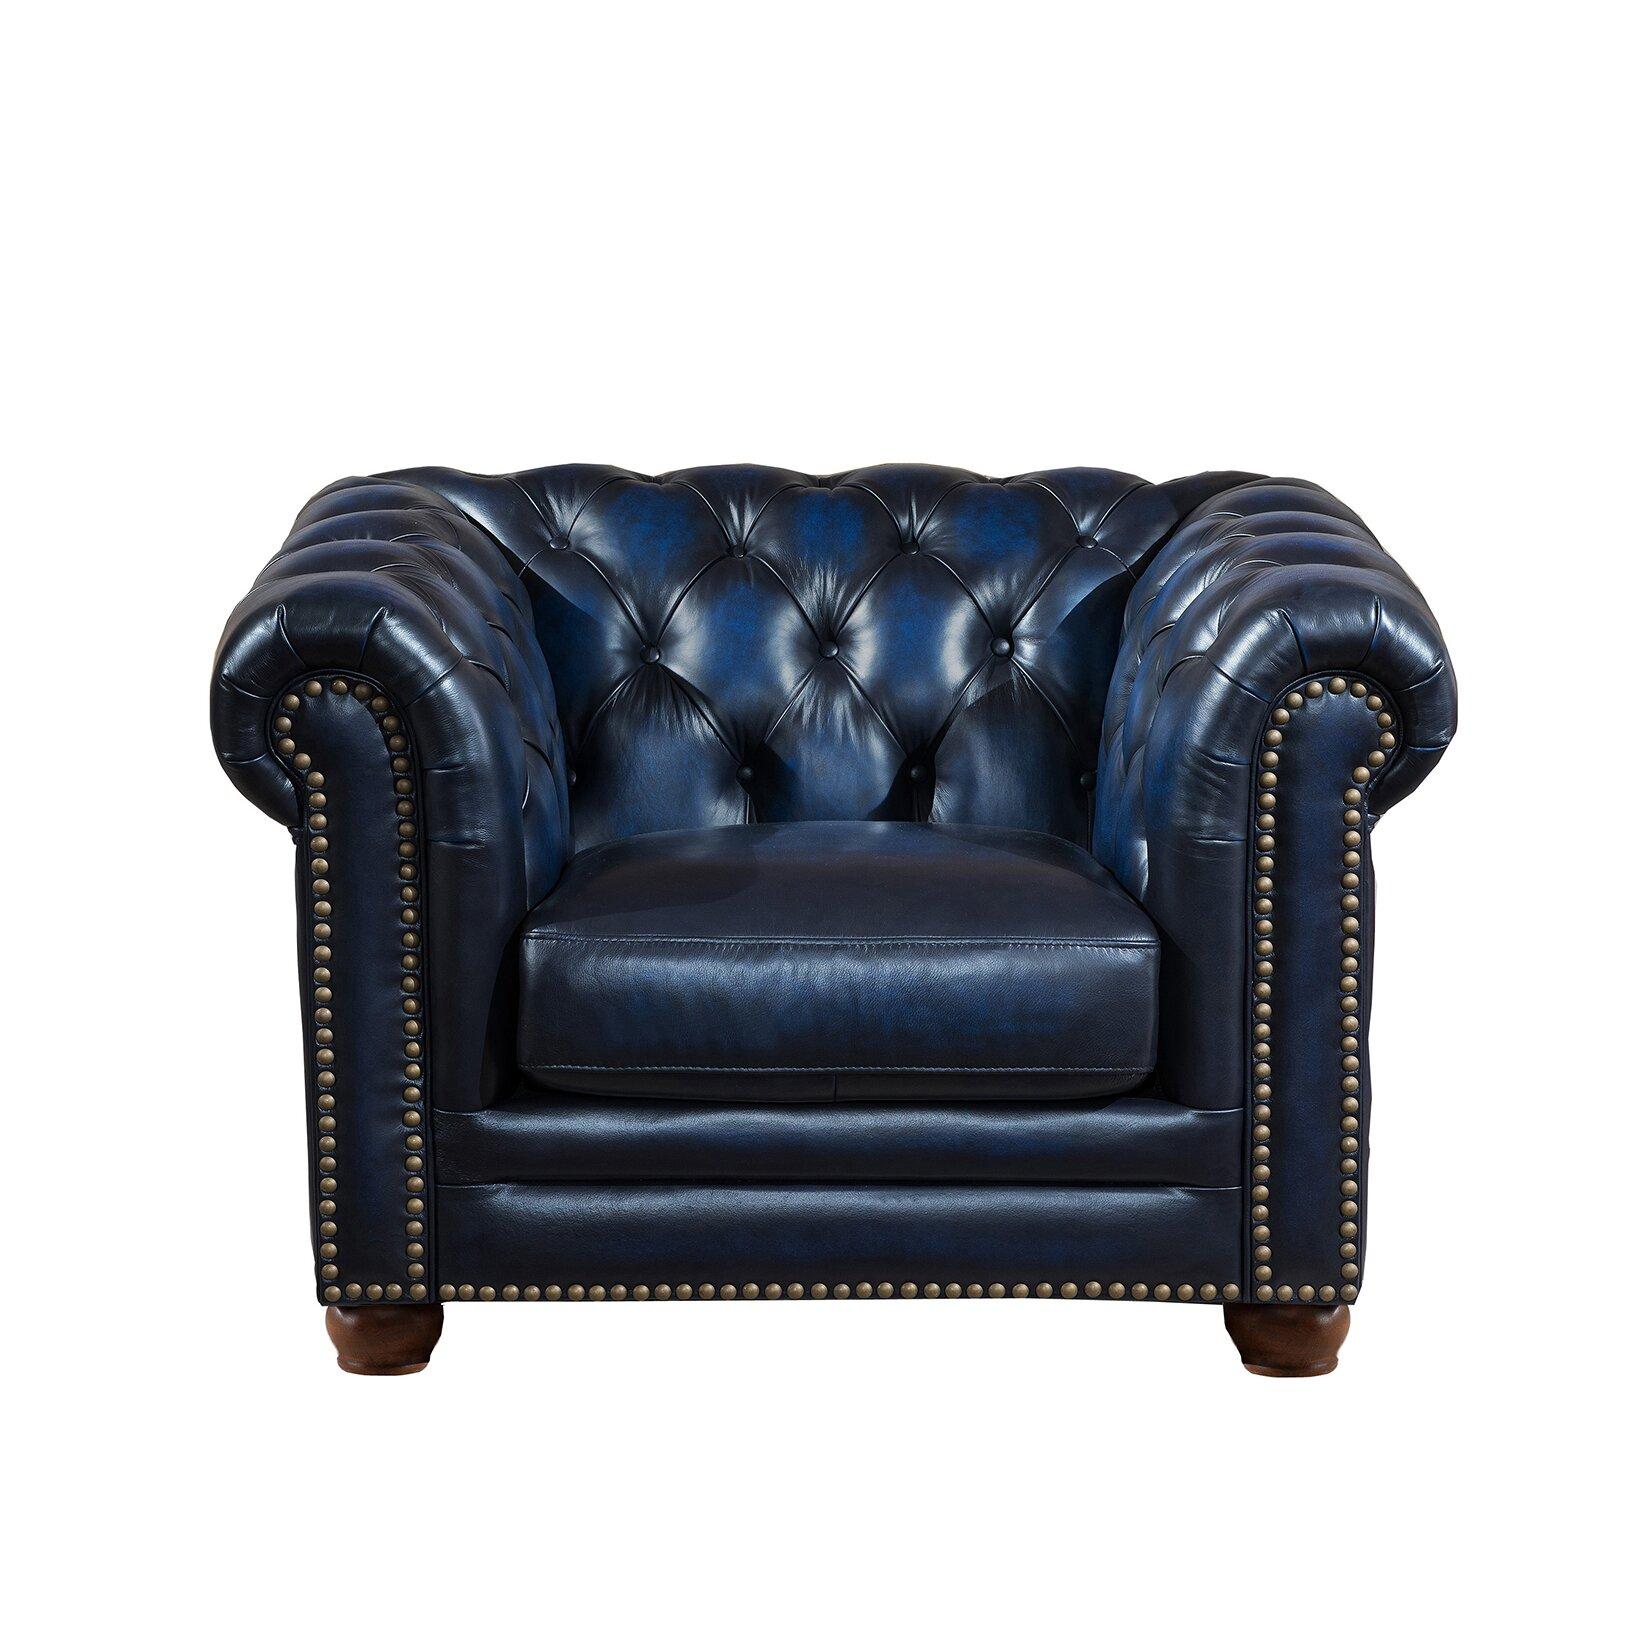 Amax Nebraska Chesterfield Genuine Leather Sofa Loveseat And Chair Set Wayfair